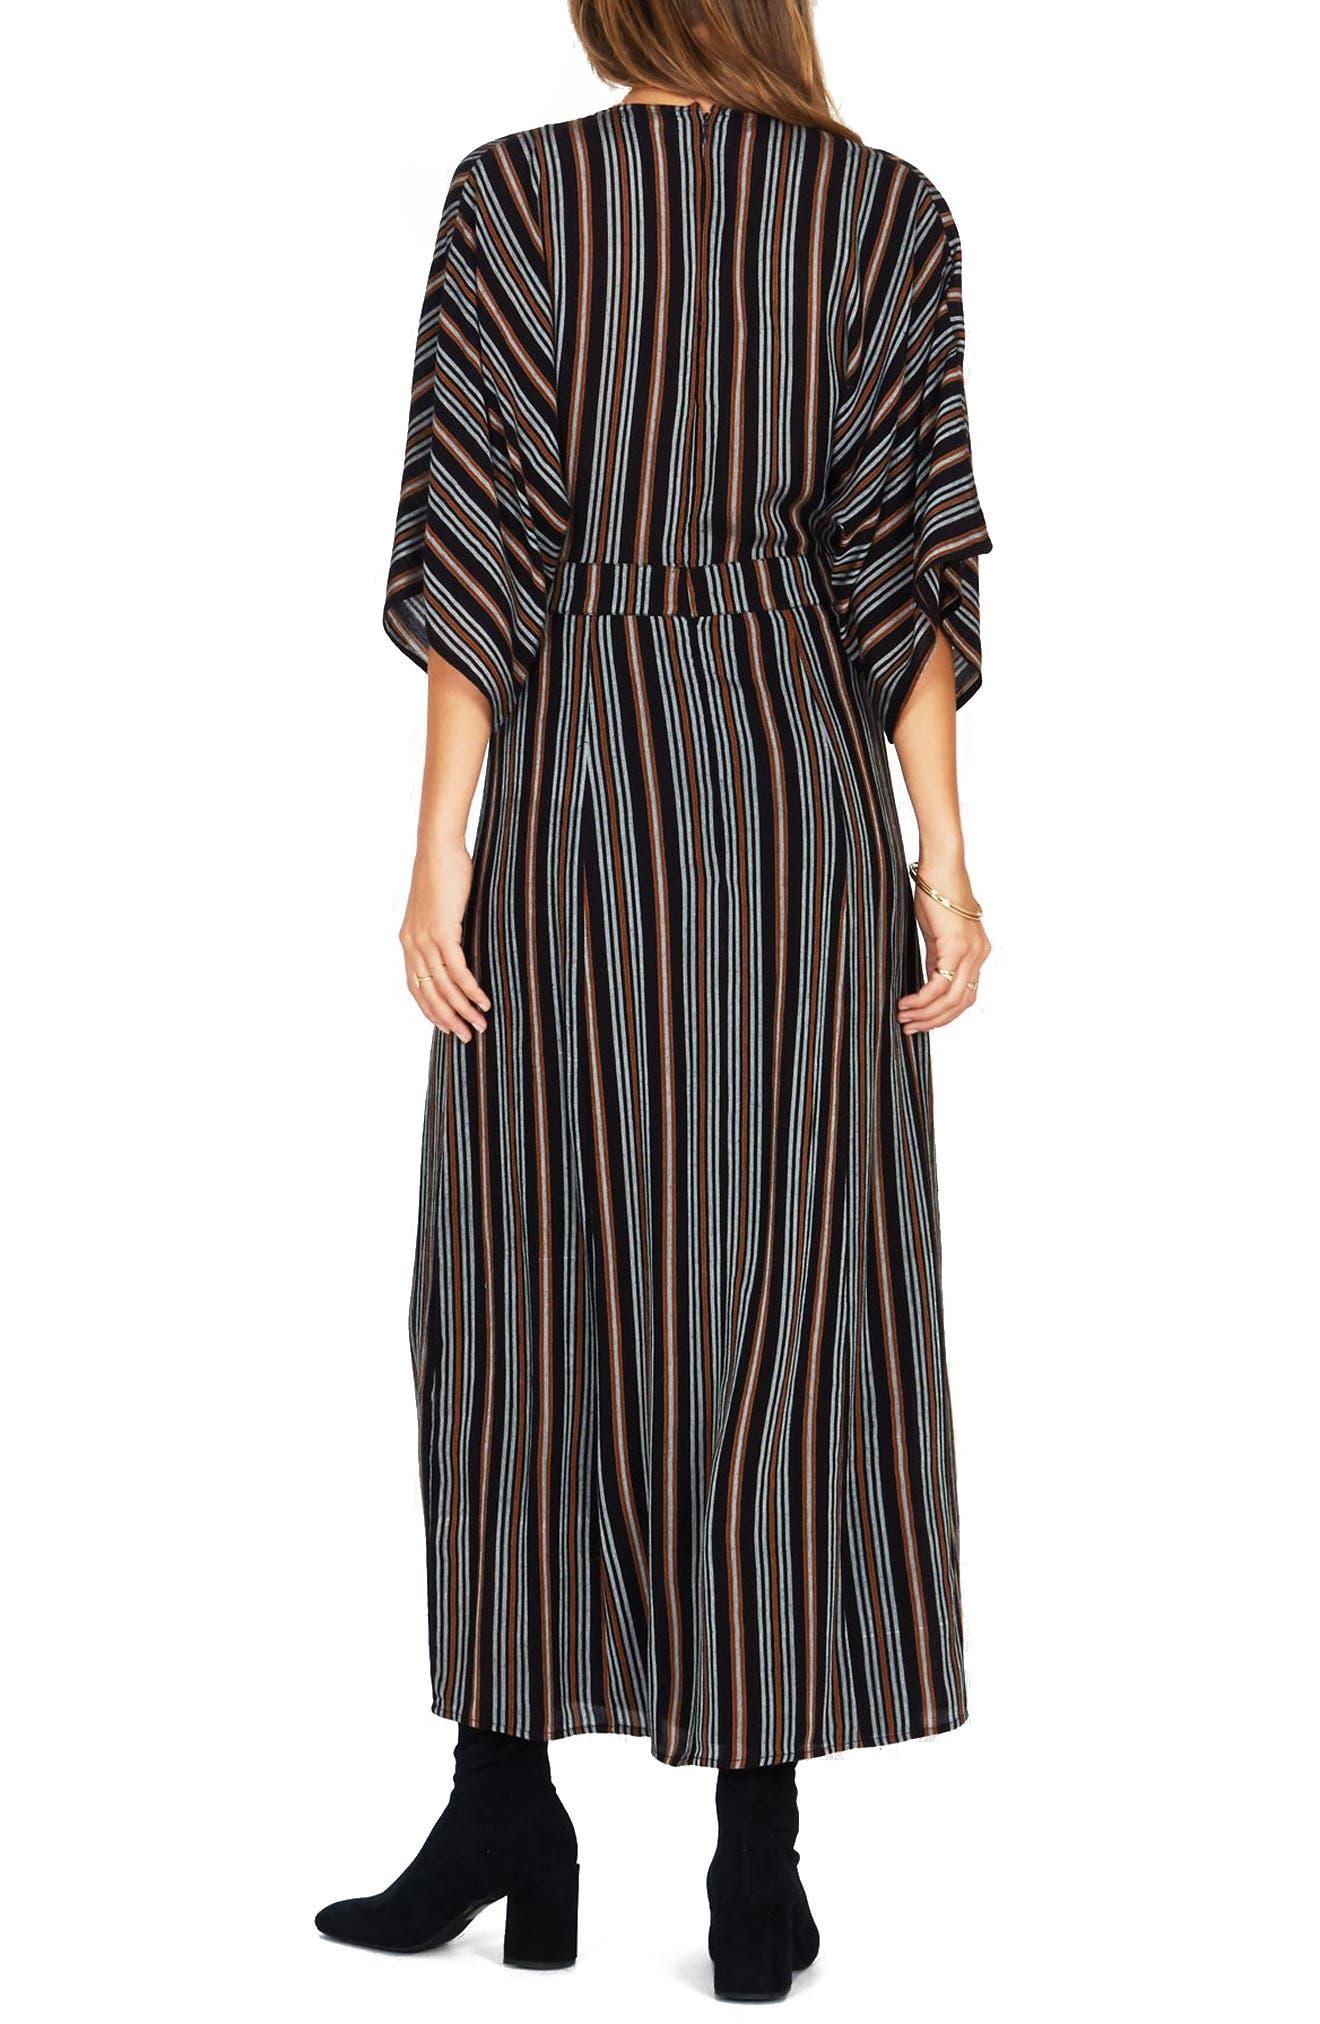 Forever & Day Stripe Maxi Dress,                             Alternate thumbnail 3, color,